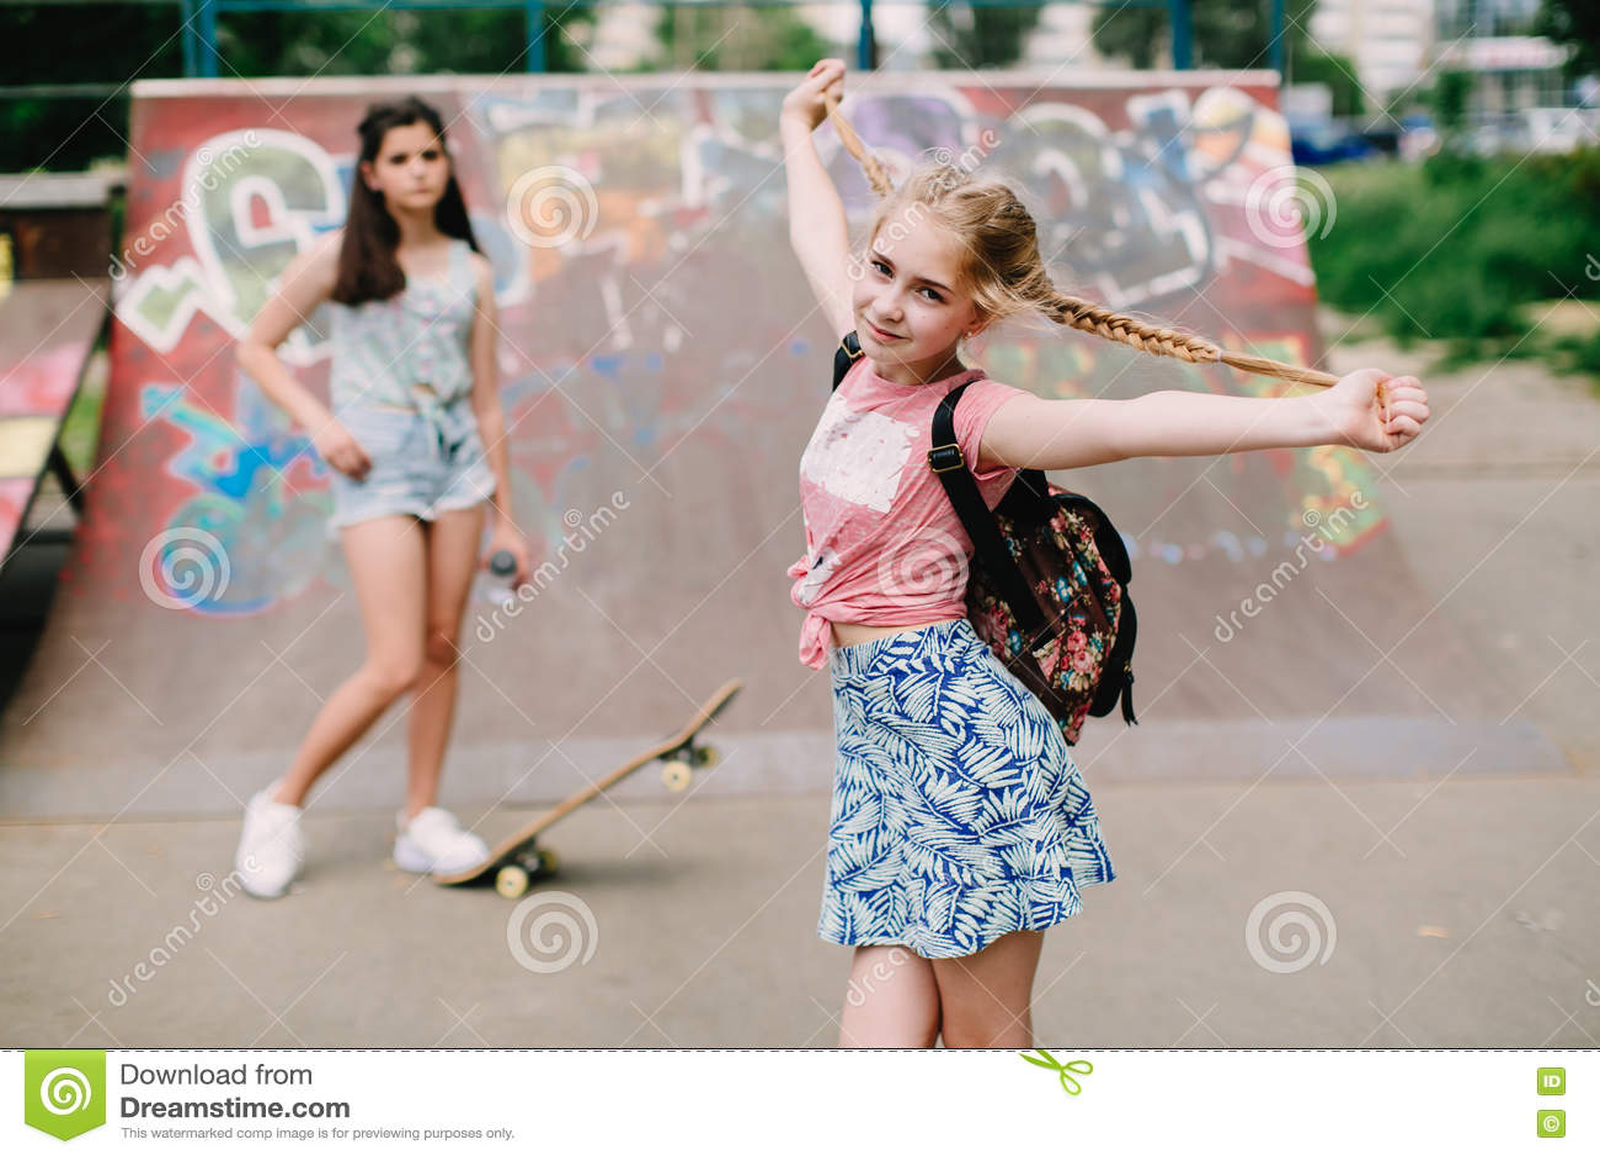 free-urban-teens-posturing